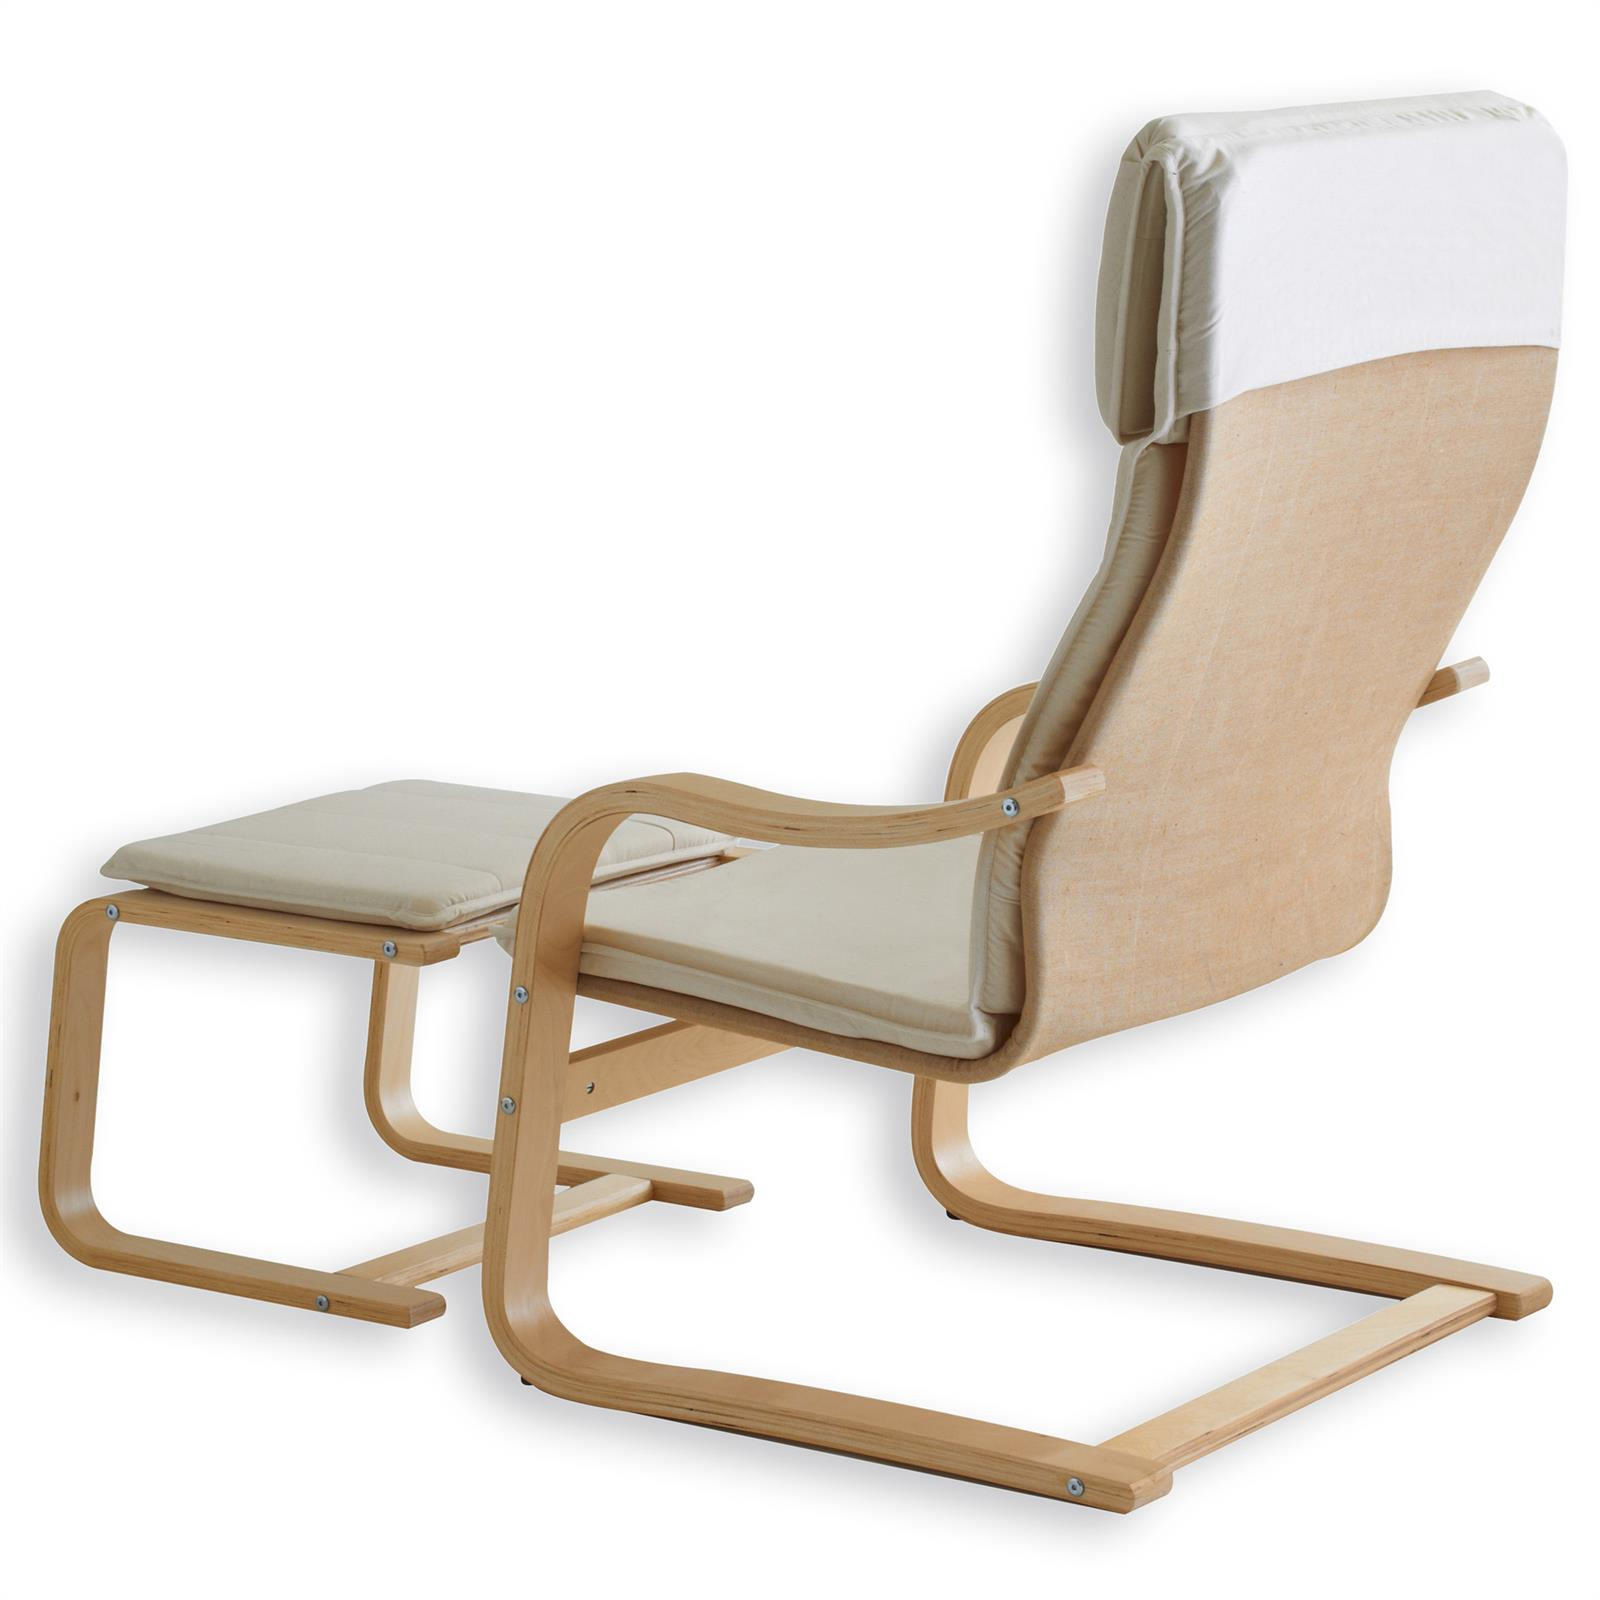 relaxsessel lina mit hocker in beige mobilia24. Black Bedroom Furniture Sets. Home Design Ideas